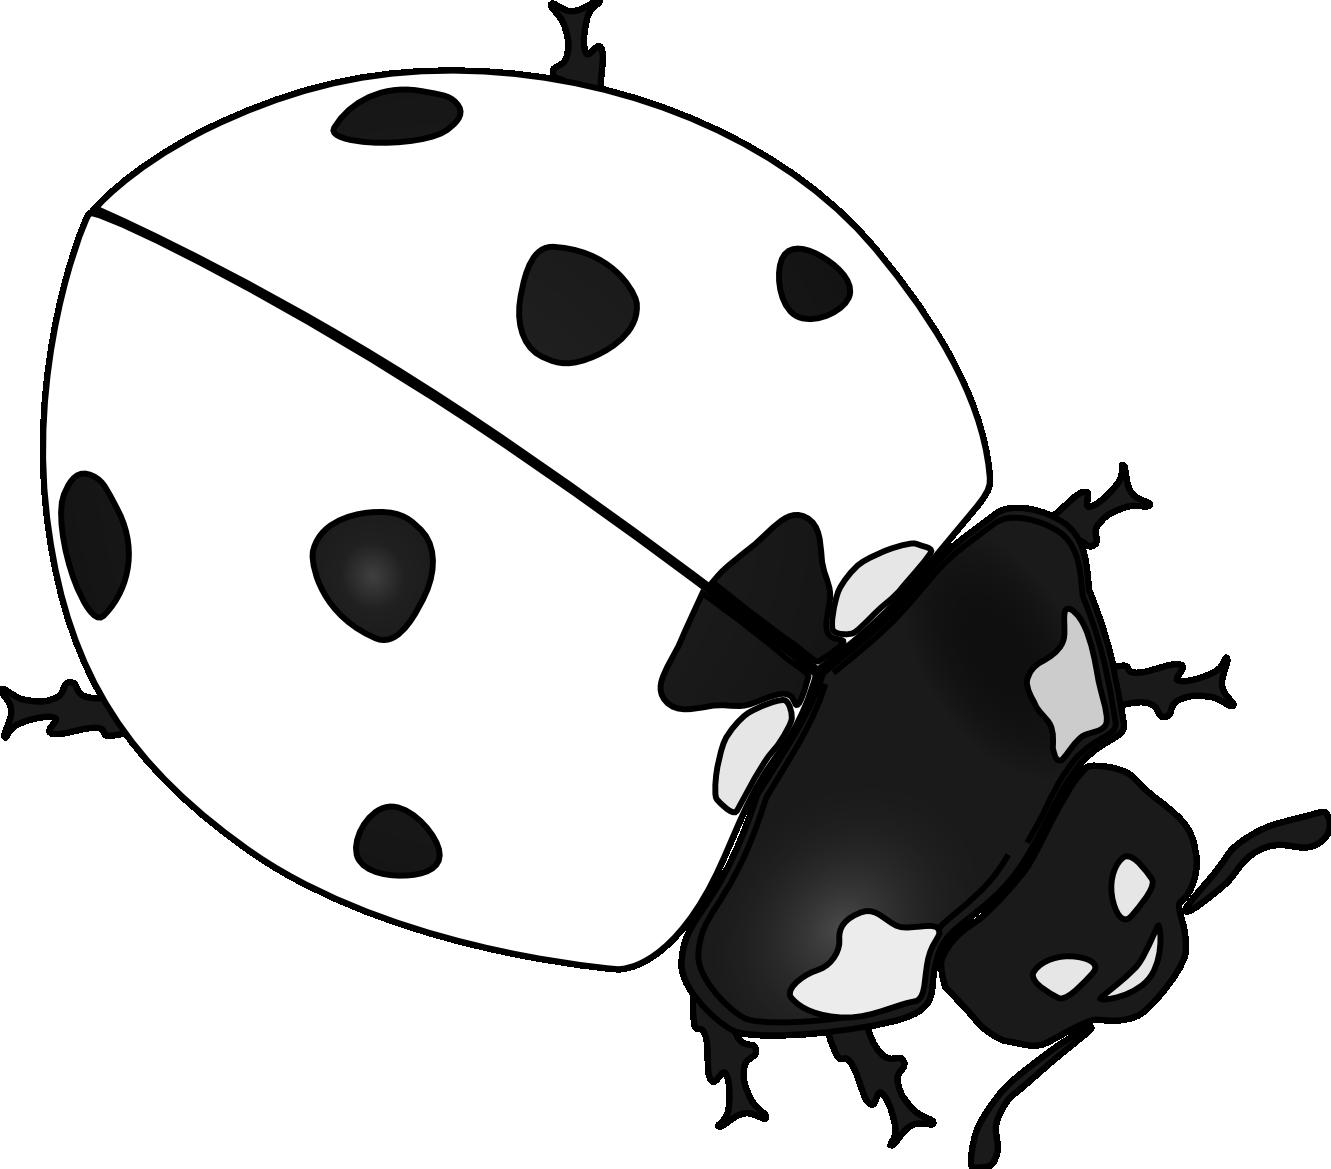 Similiar Black And White Ladybug Clip Art Keywords.